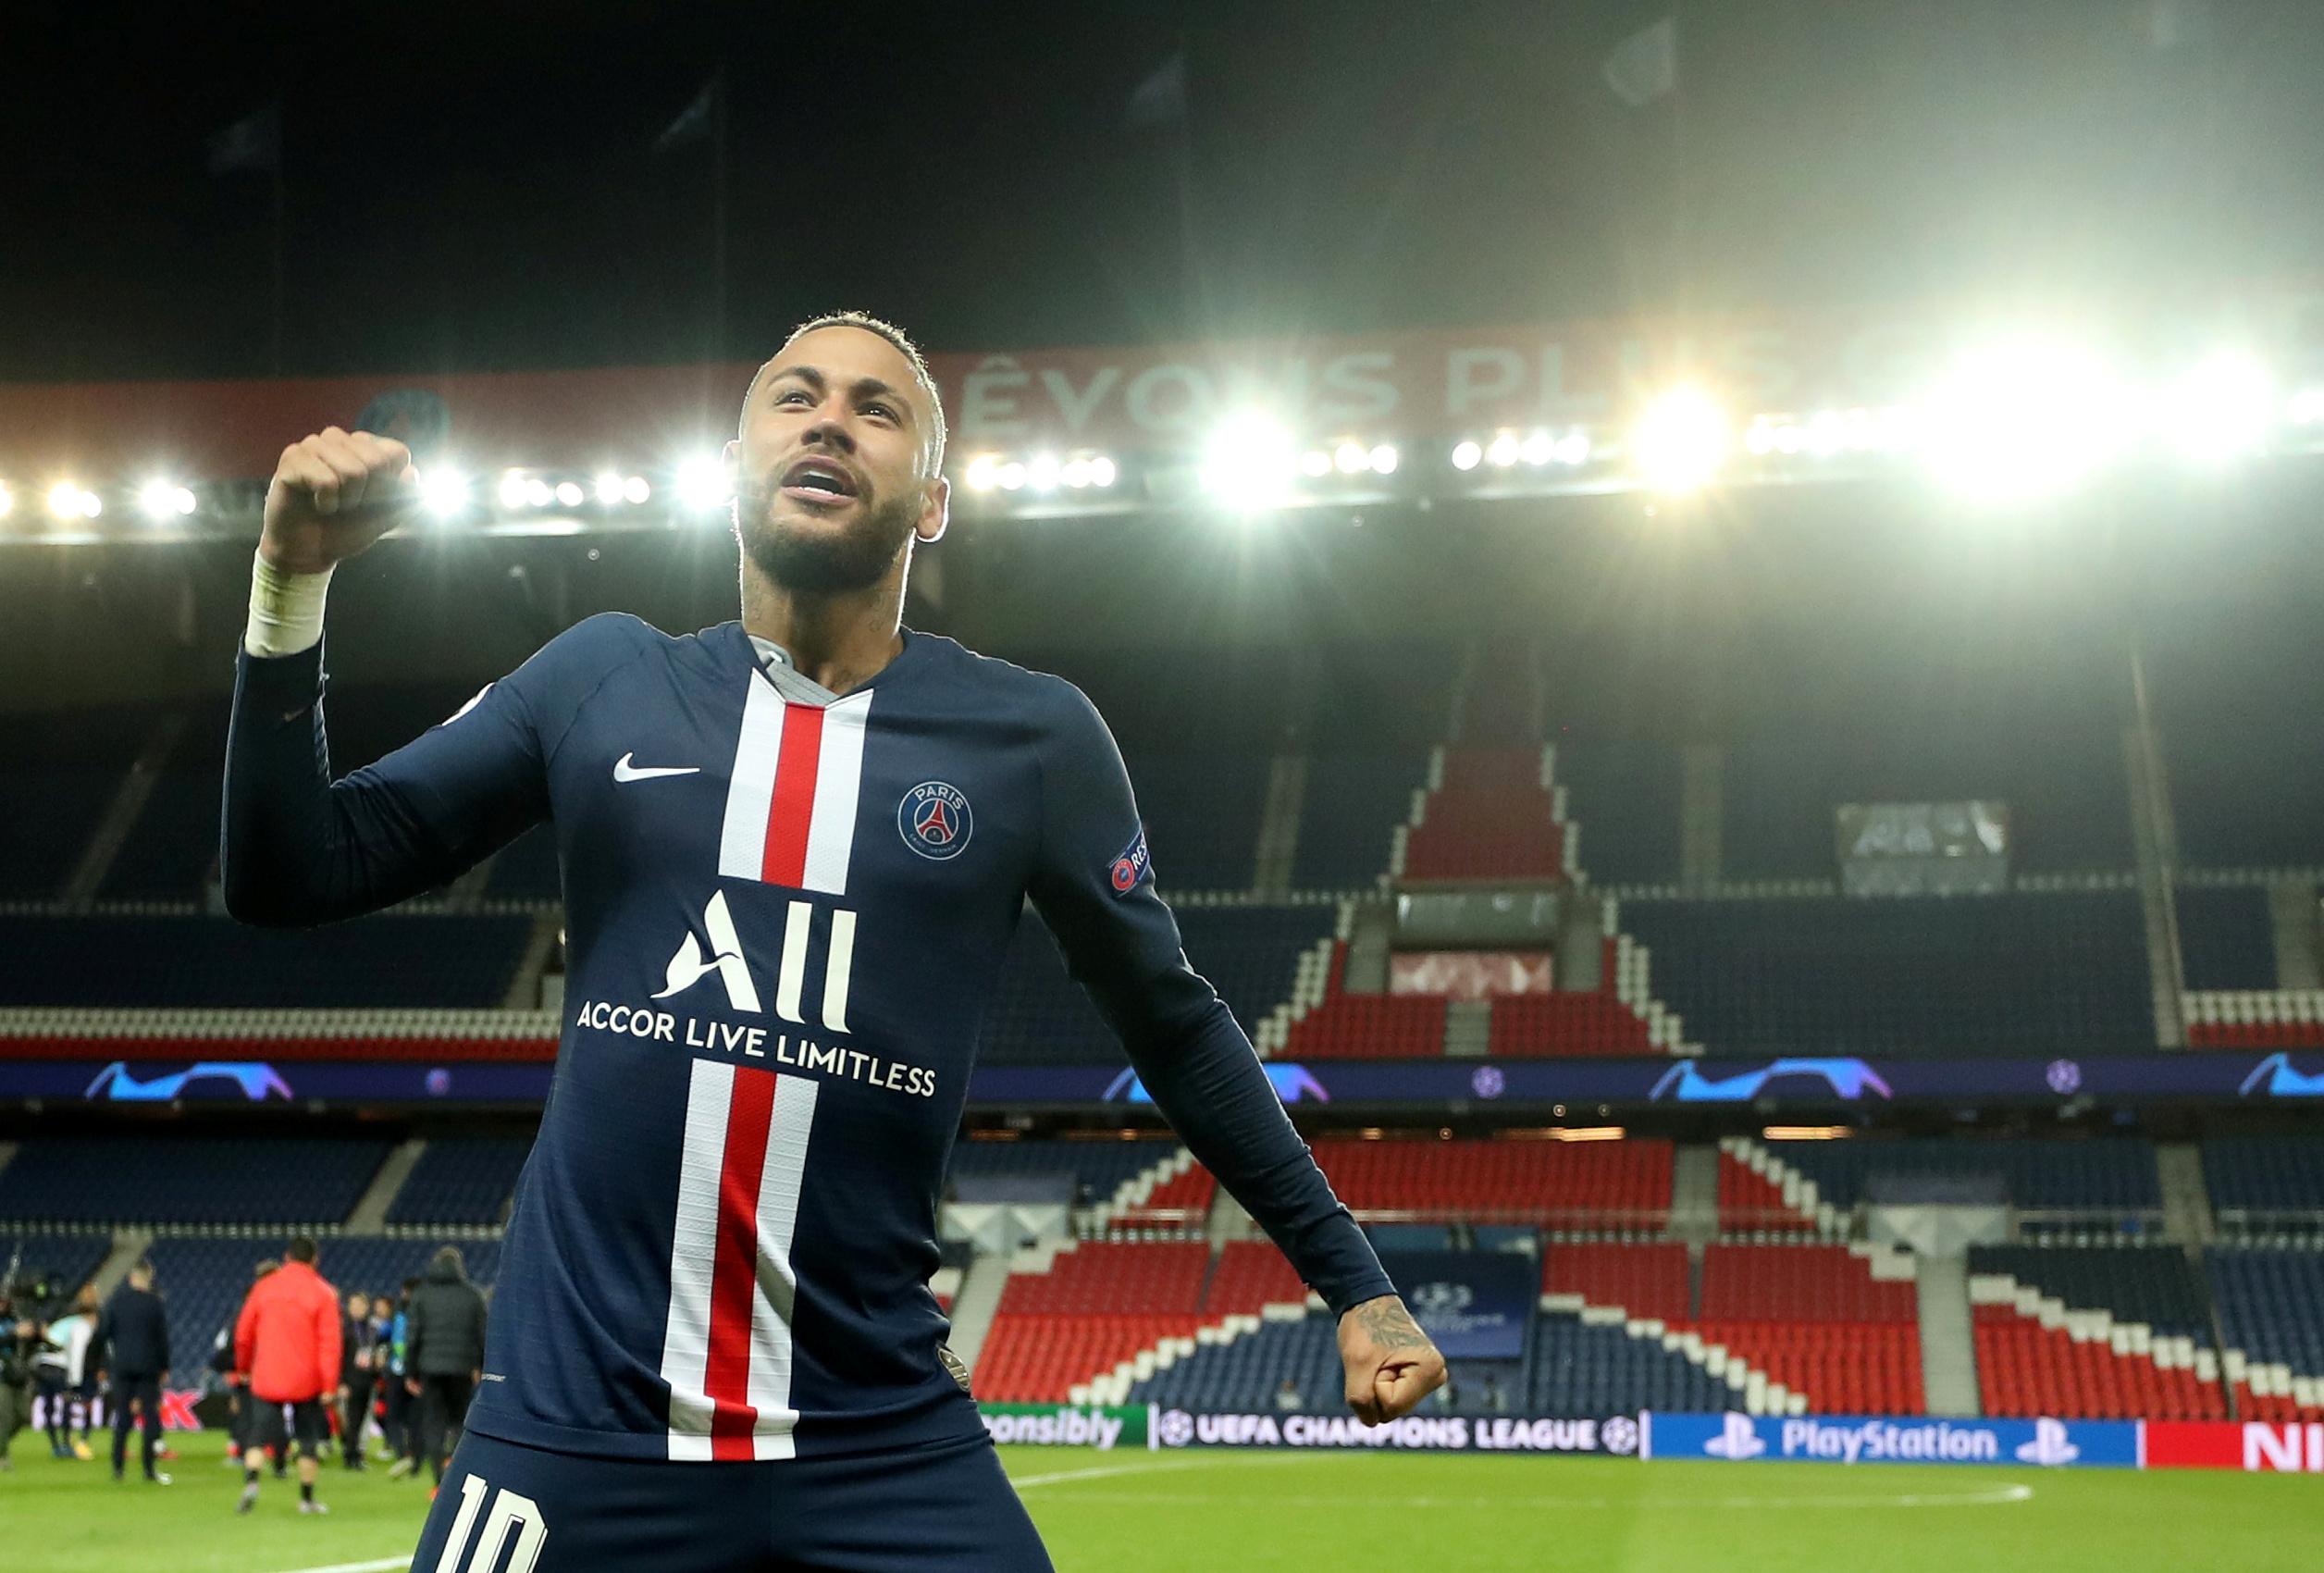 Football - Ligue des champions - Neymar veut «écrire l'Histoire» avec le PSG en Ligue des champions